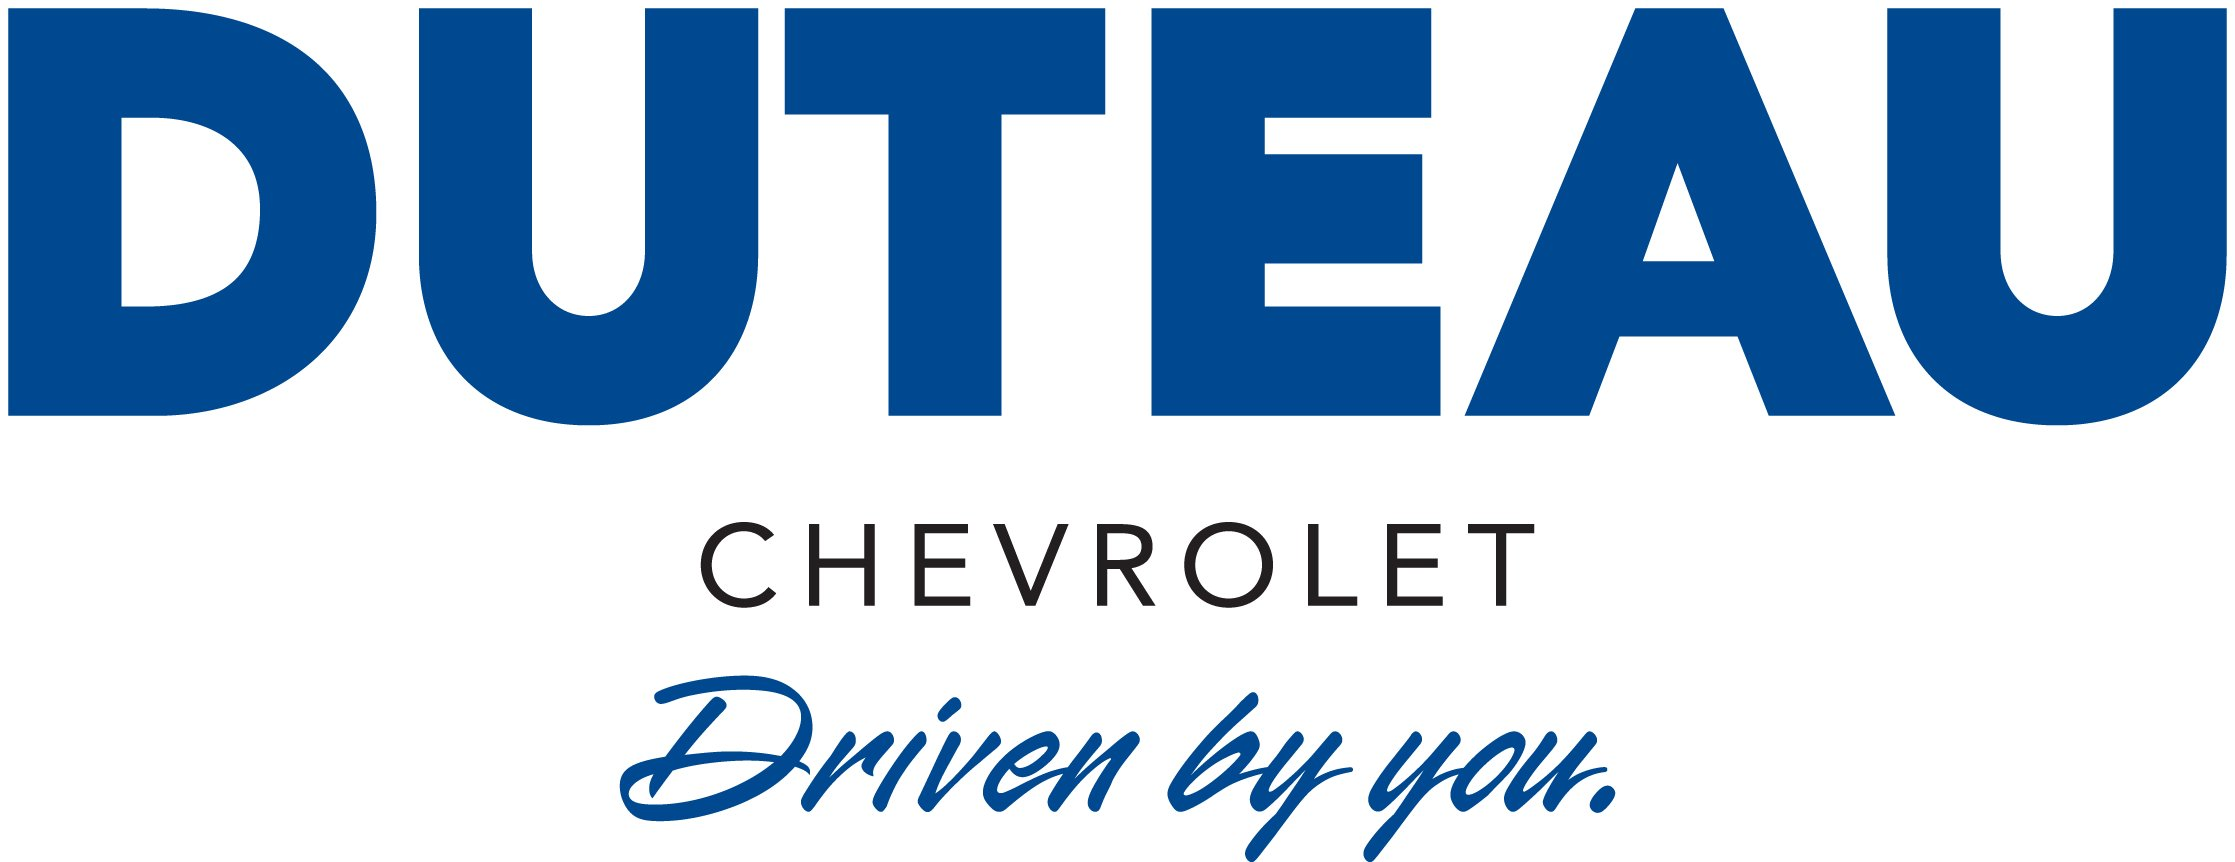 Duteau Chevrolet Subaru 7300 S 27th St Lincoln Ne 68512 Yp Com